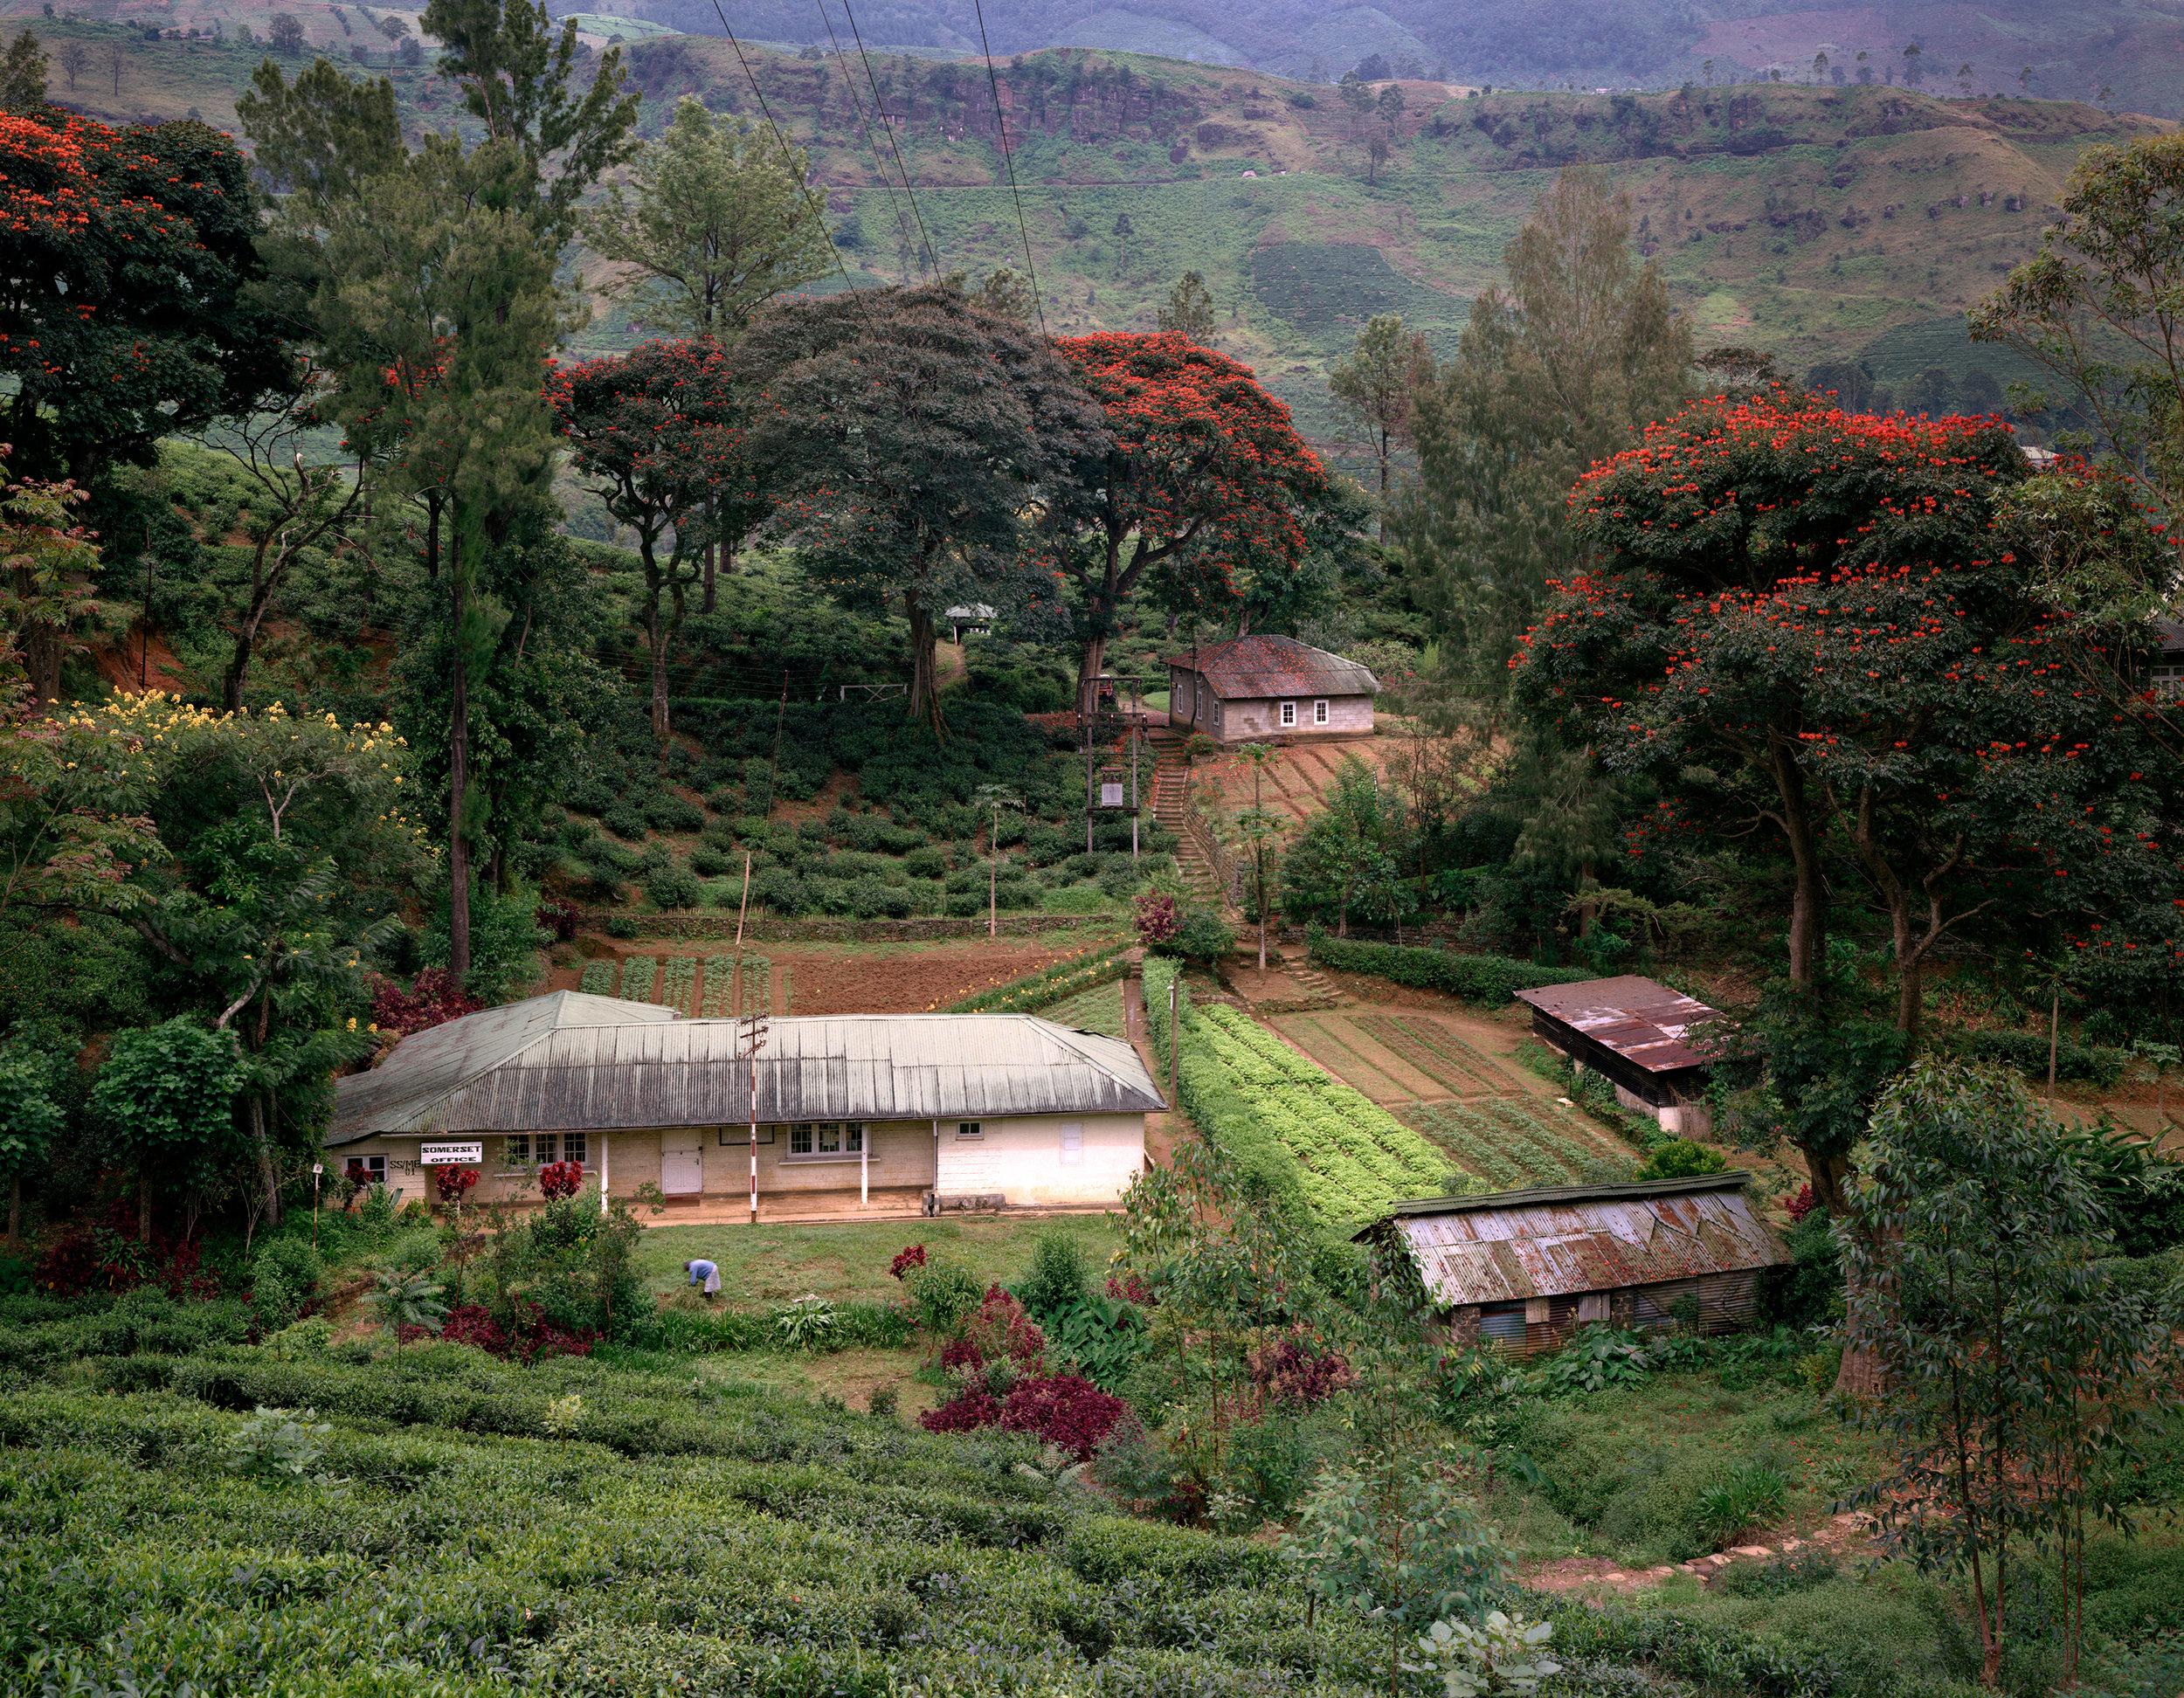 Somerset Tea Plantation Office and Flame Trees in the Jungle, near Nuawra Eliya, Sri Lanka, 1993